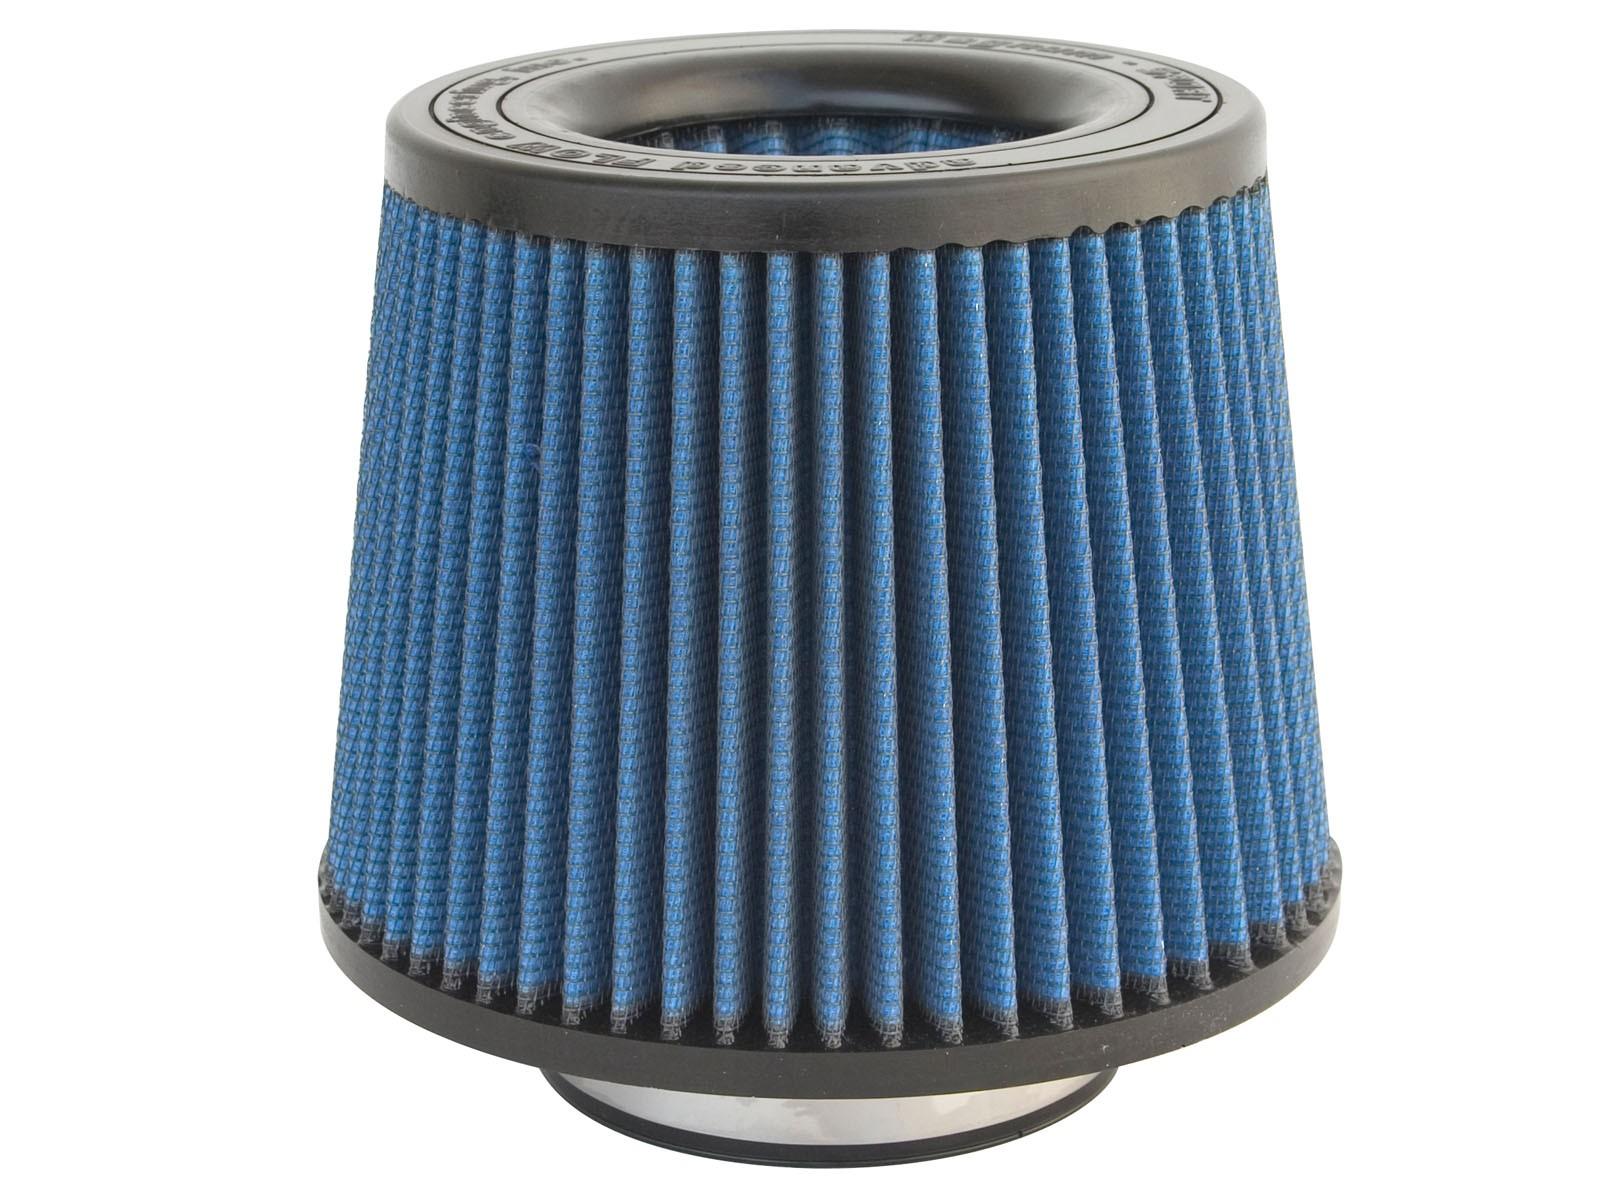 aFe POWER 24-91034 Magnum FLOW Pro 5R Air Filter